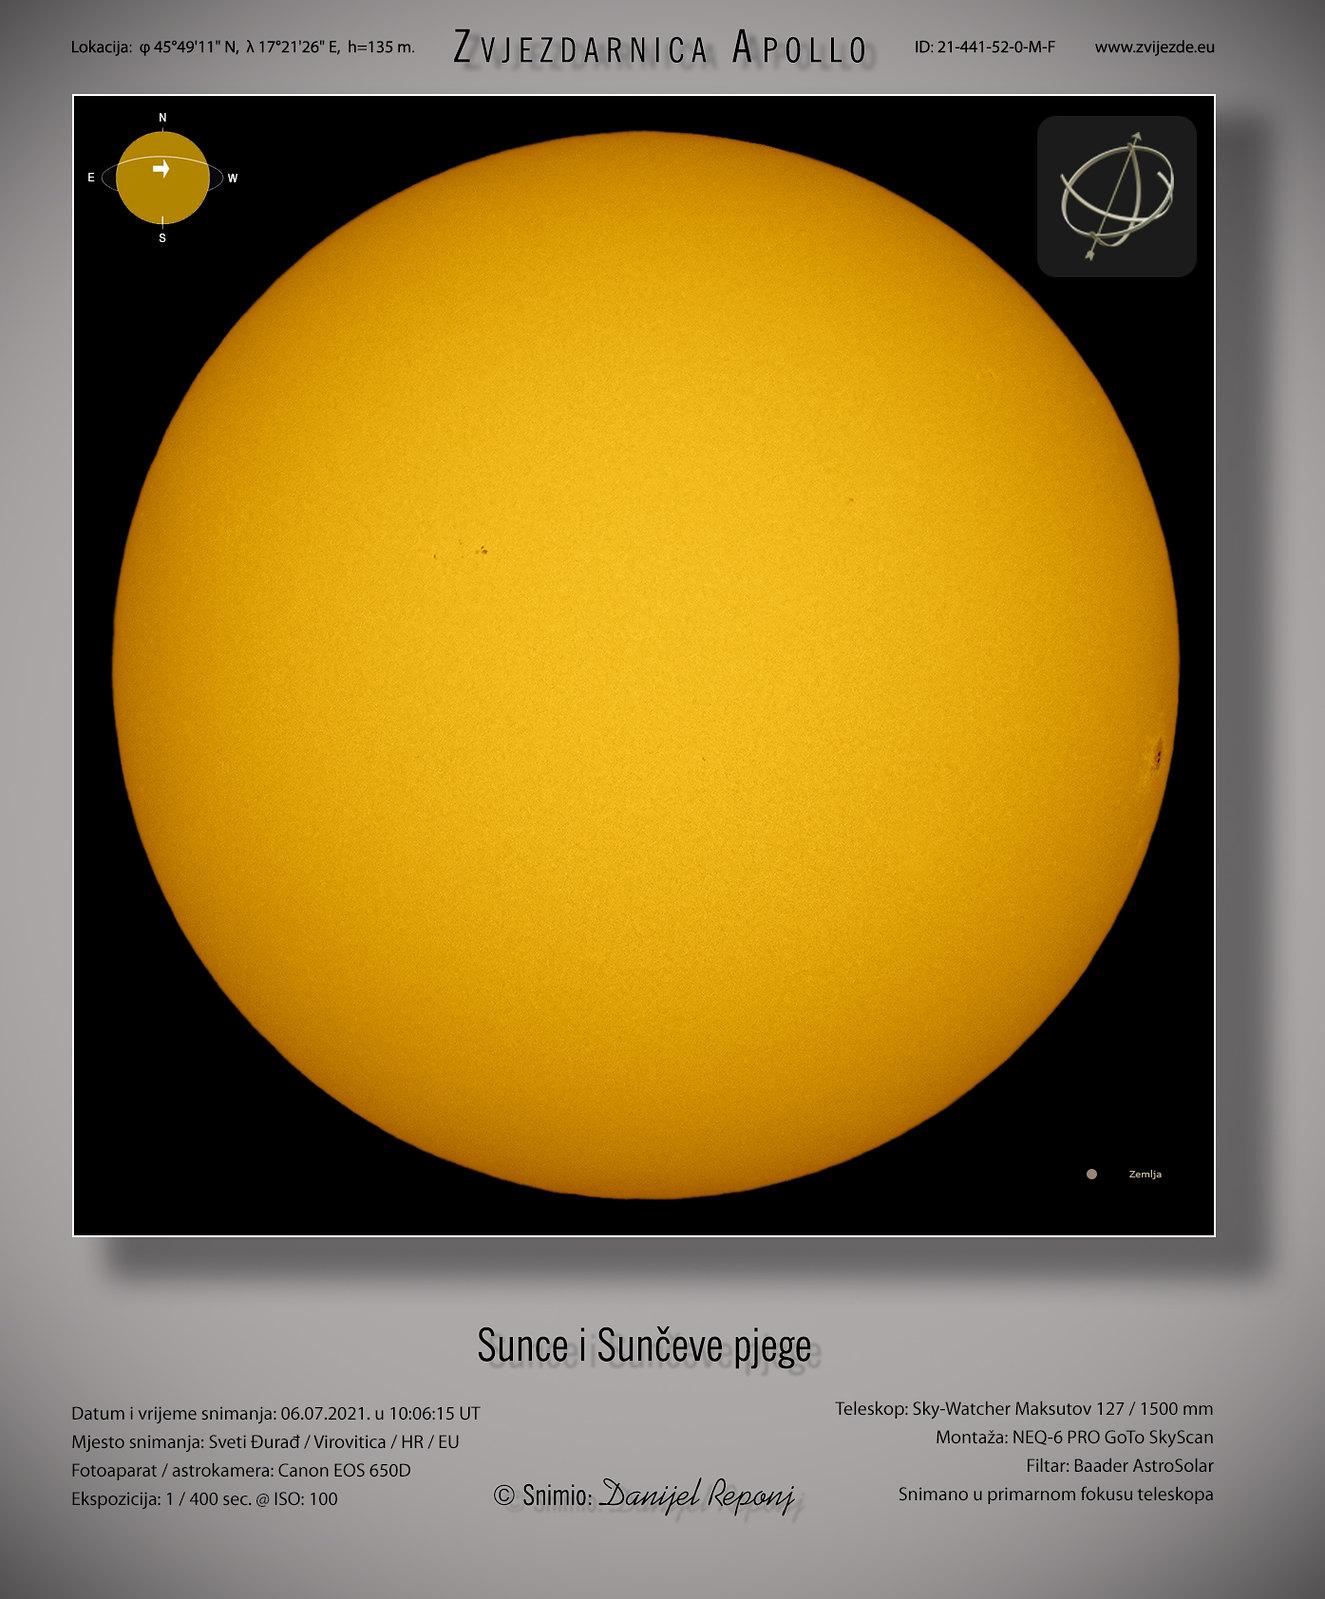 Sunce i pjege, 6.7.2021.